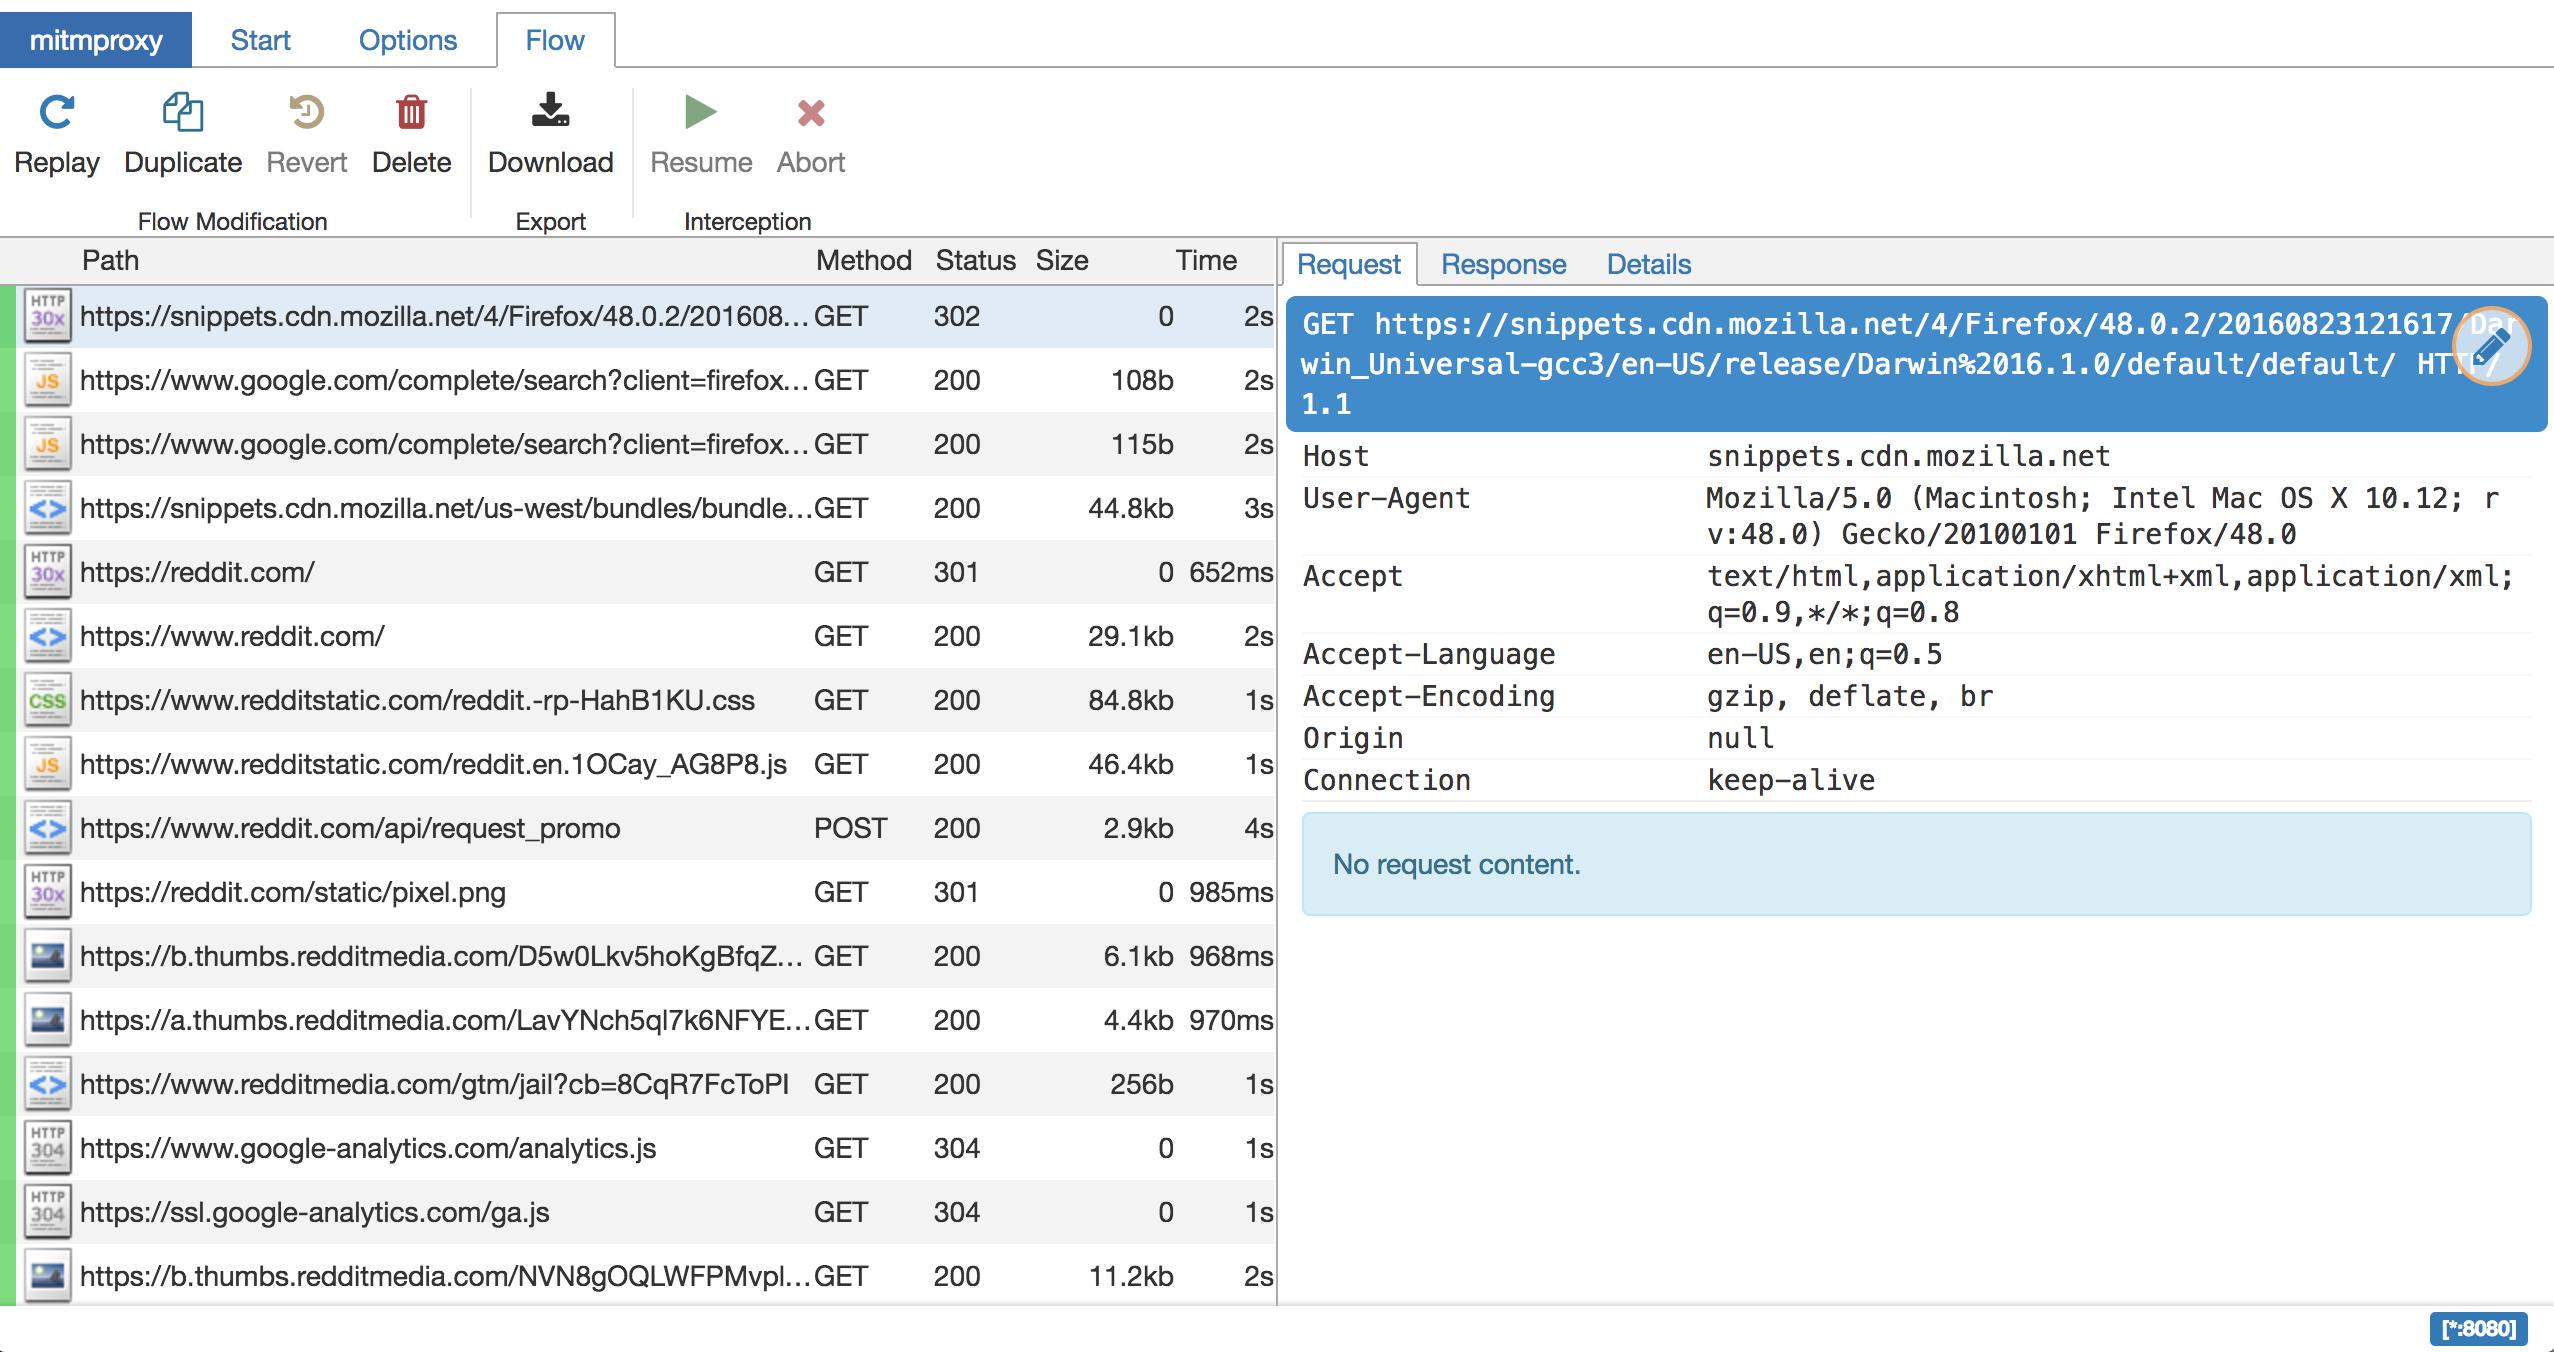 cortesi - mitmproxy: release v1.0.0 - The Christmas Edition